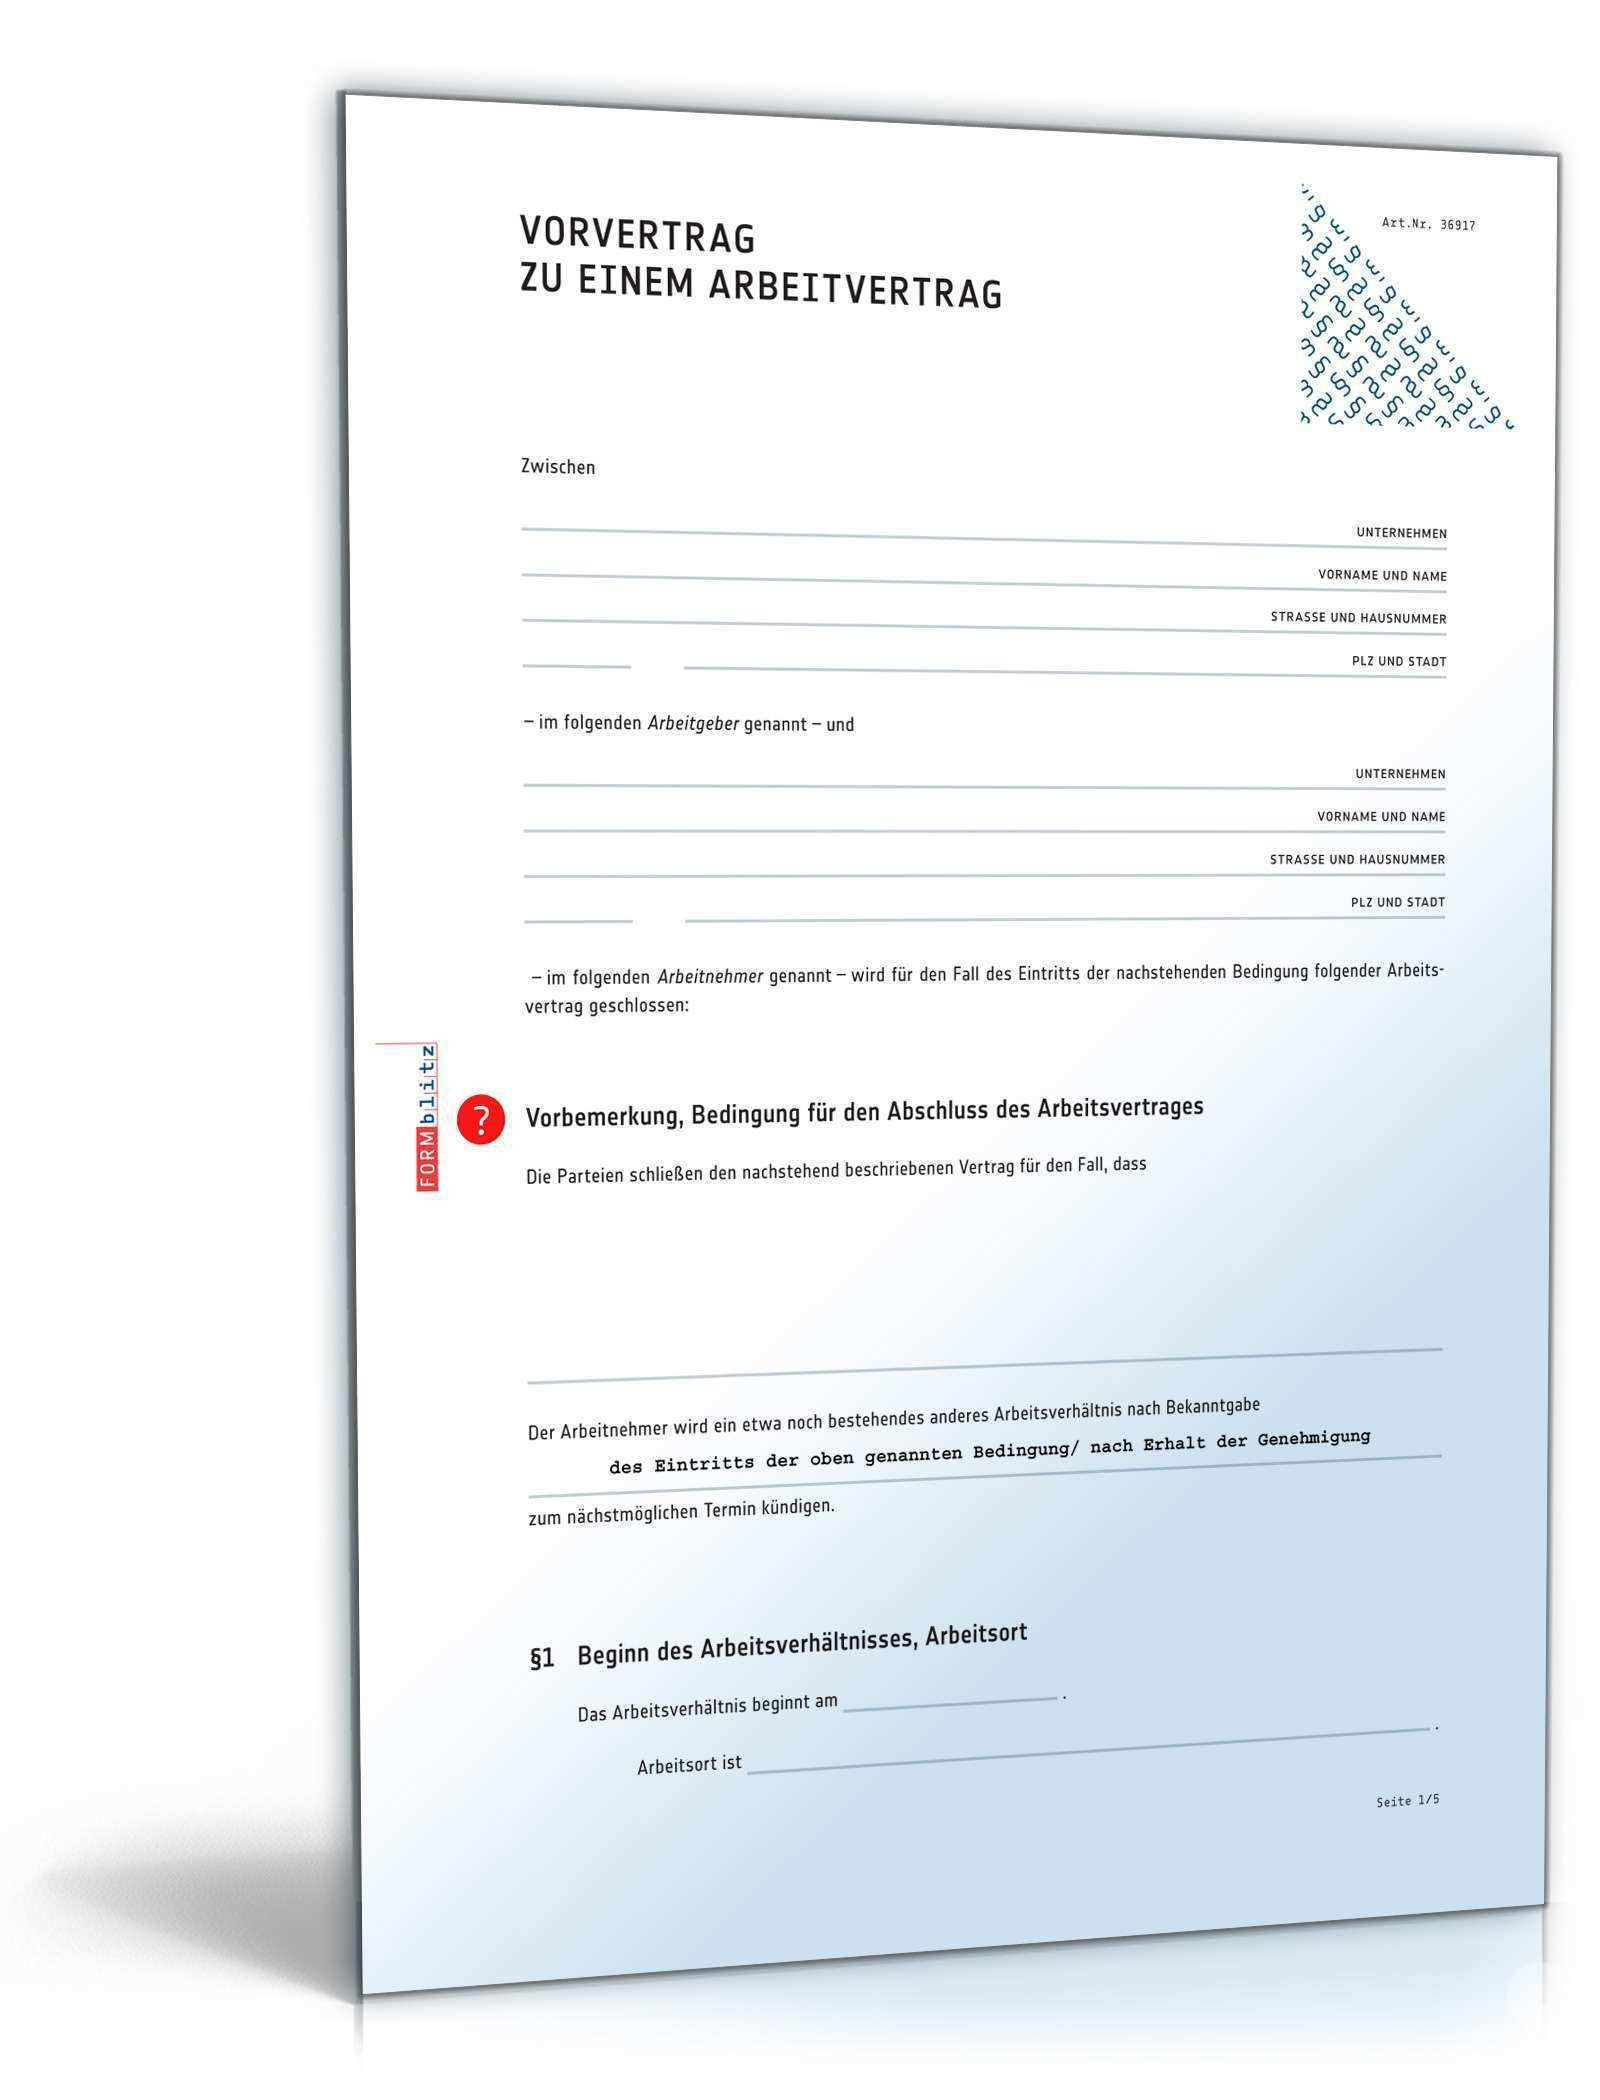 Vorvertrag Arbeitsvertrag Rechtssicheres Muster Zum Download